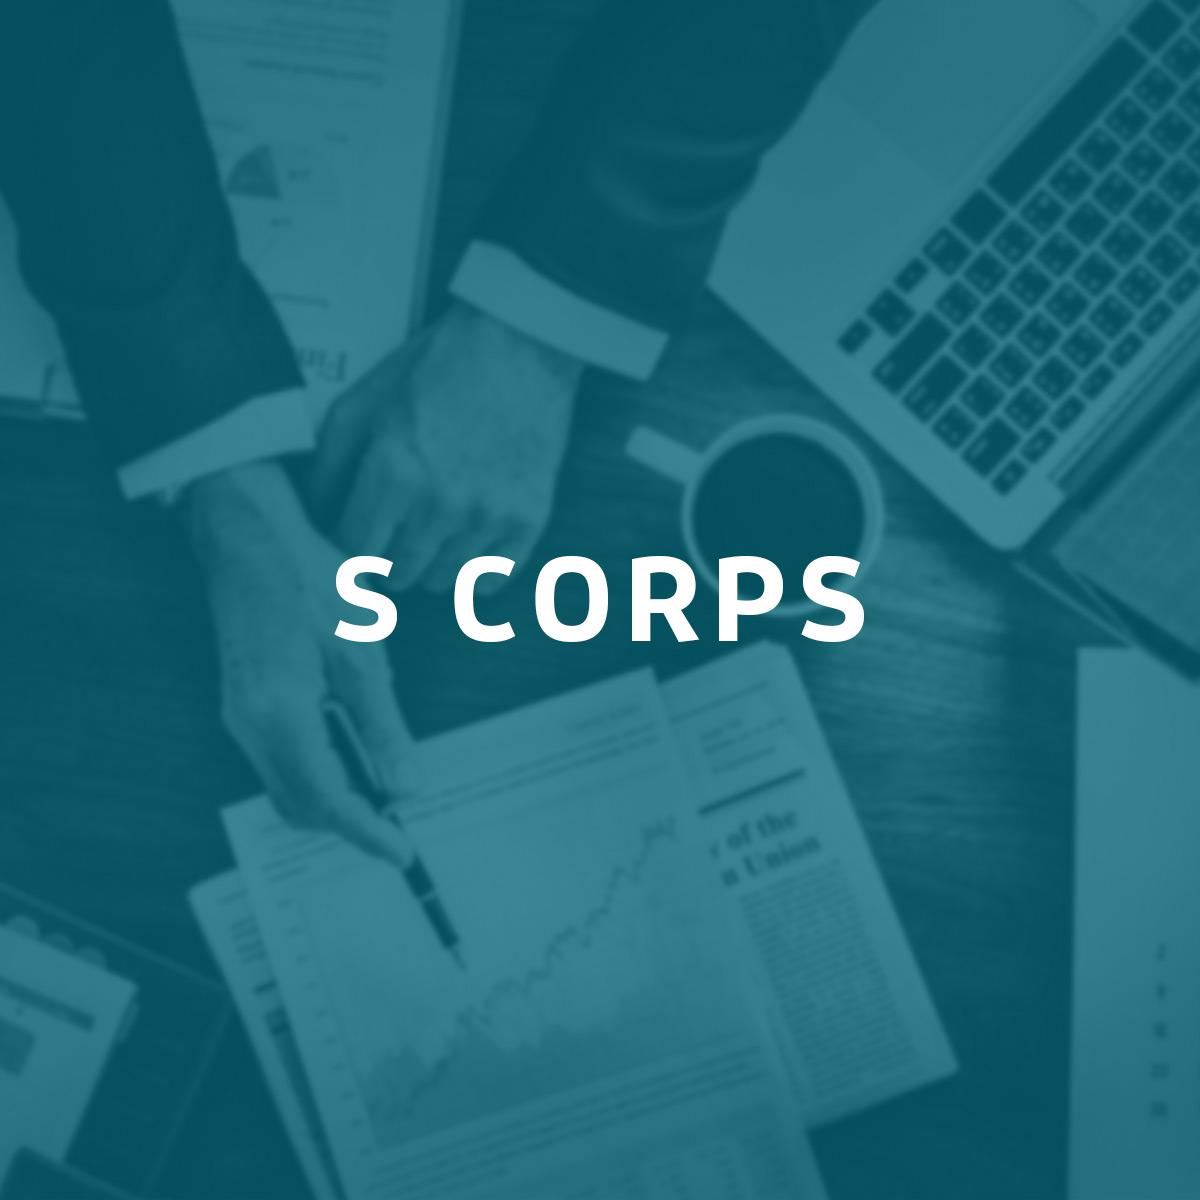 1-S-Corps-Txt.jpg